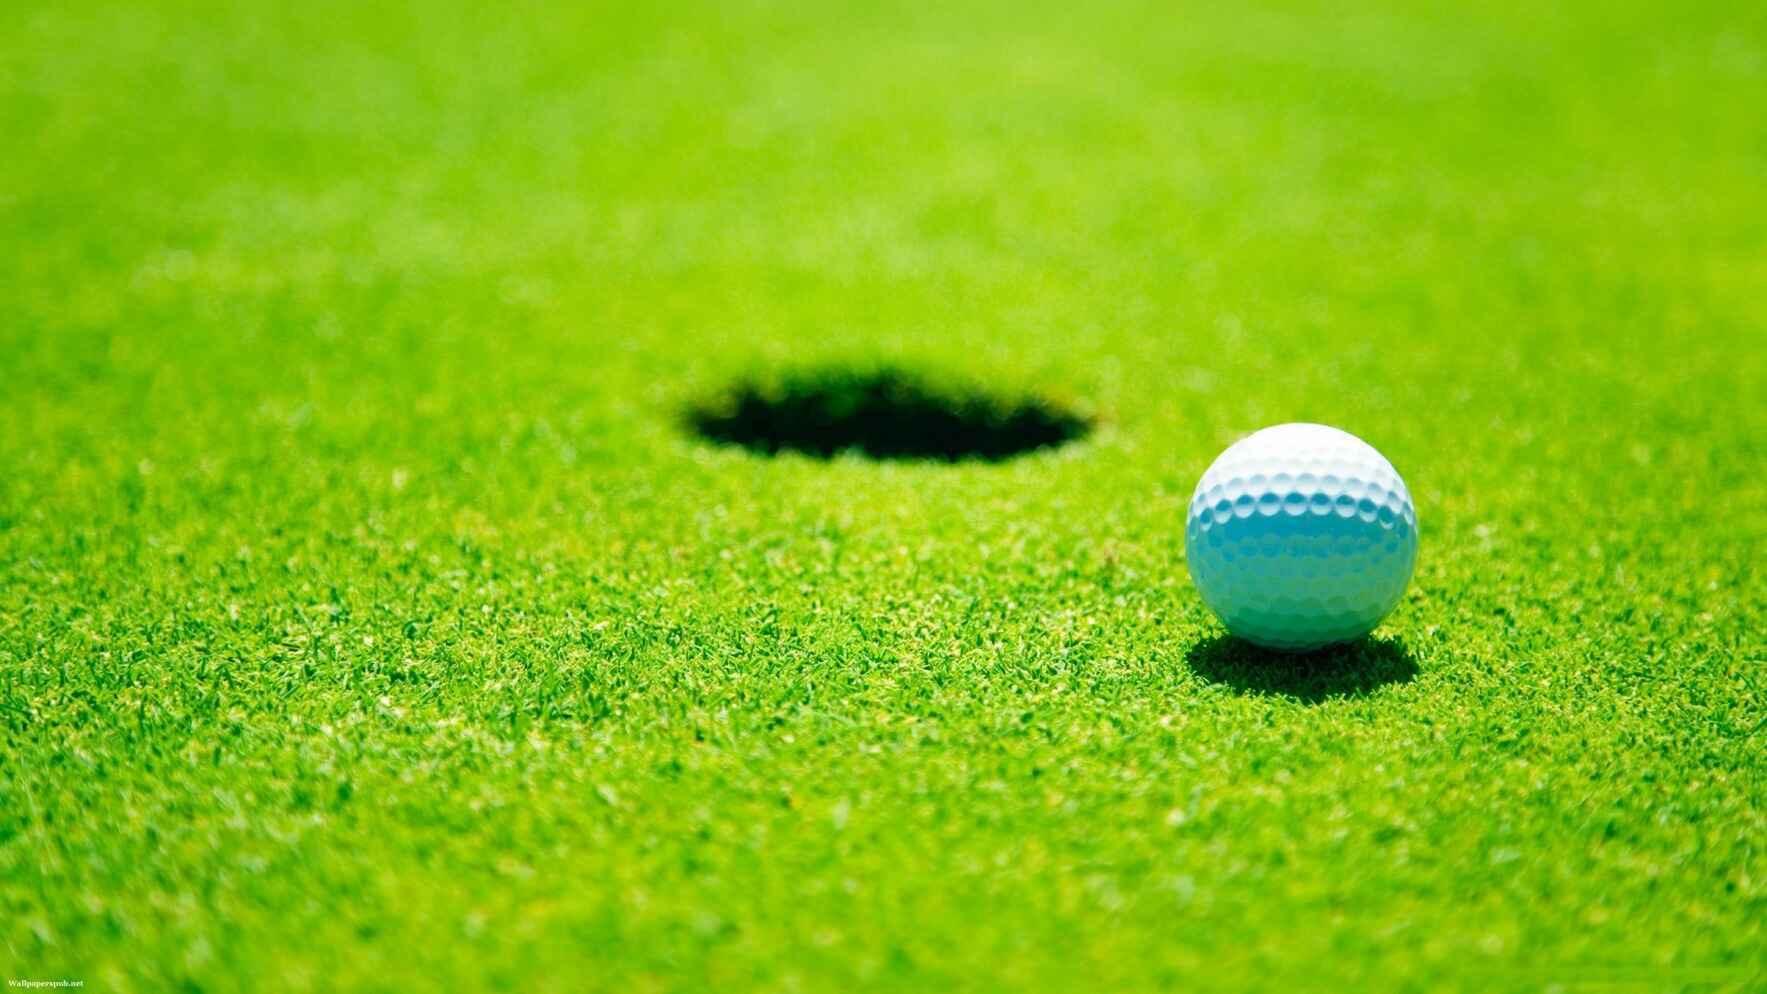 5th Annual Grace Clinics Charity Golf Scramble 2021 image